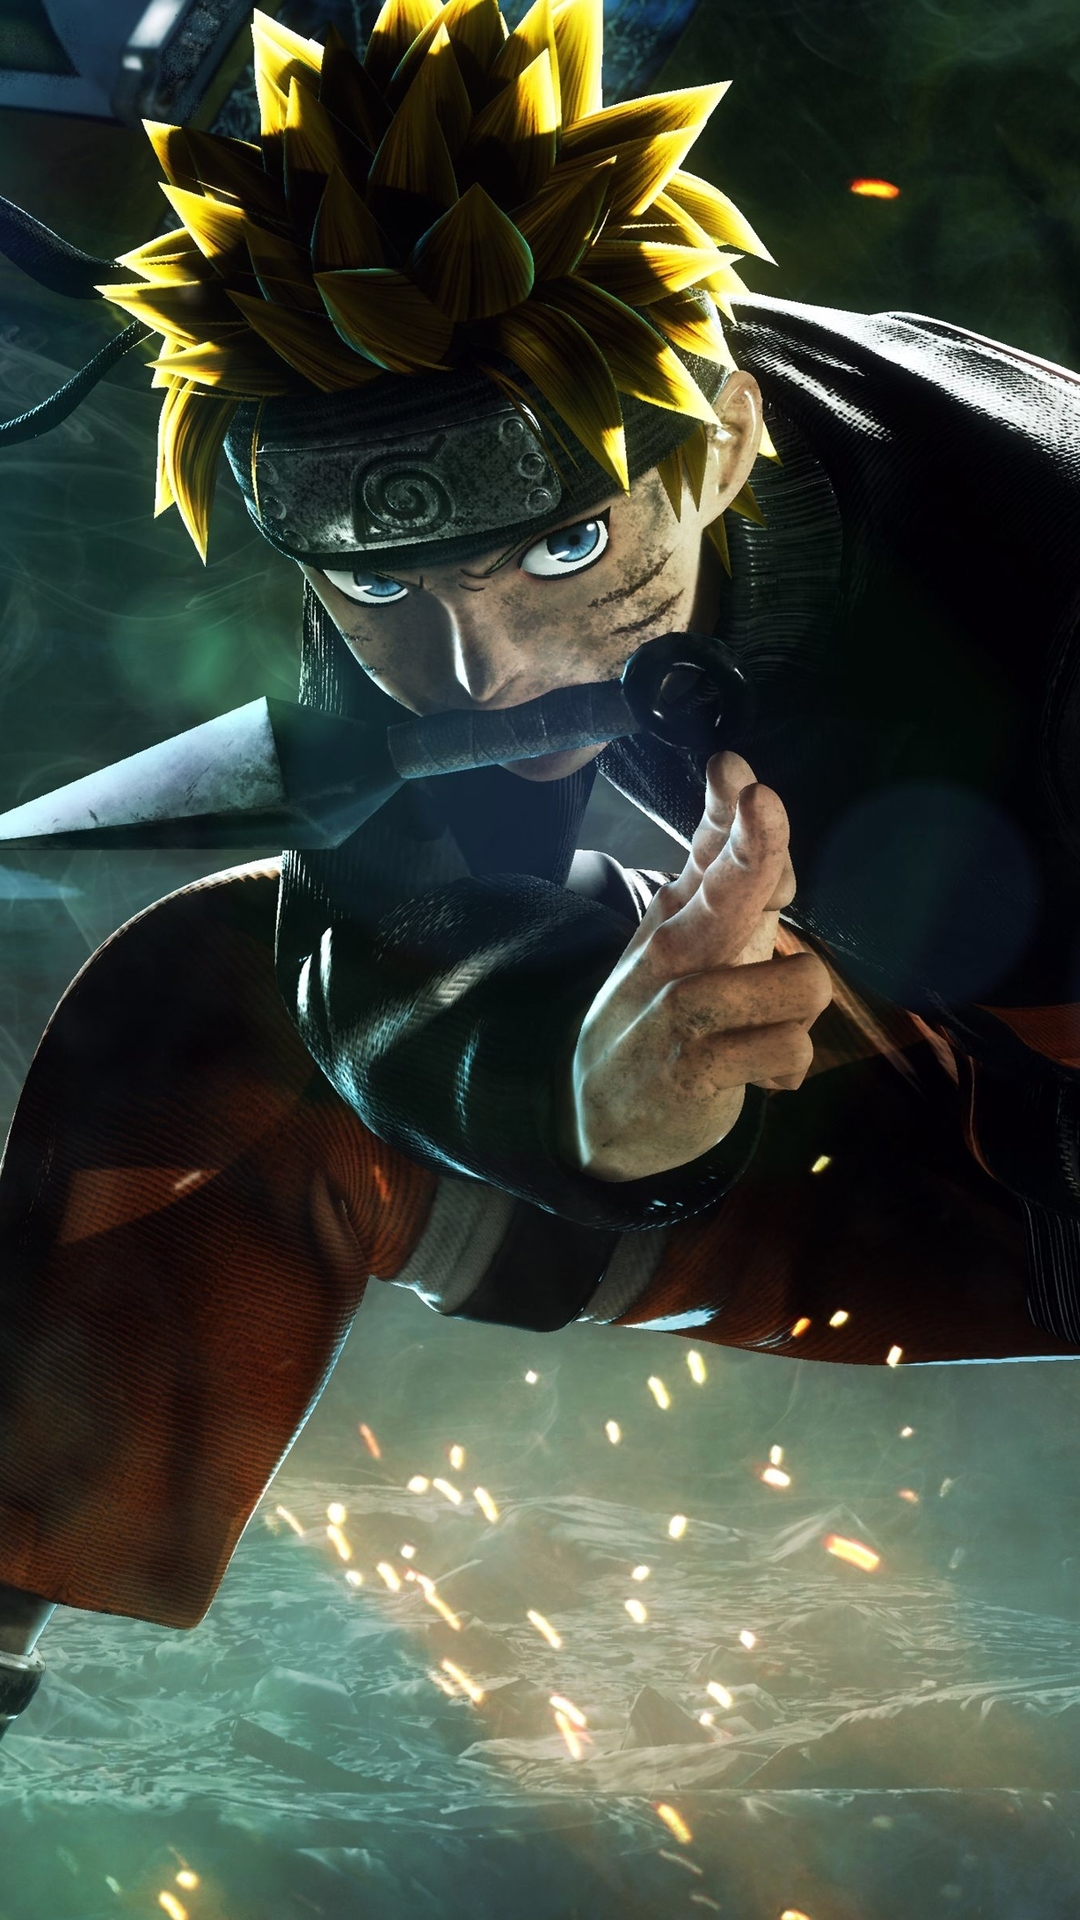 Naruto 1080x1920 Wallpapers   Top Naruto 1080x1920 1080x1920